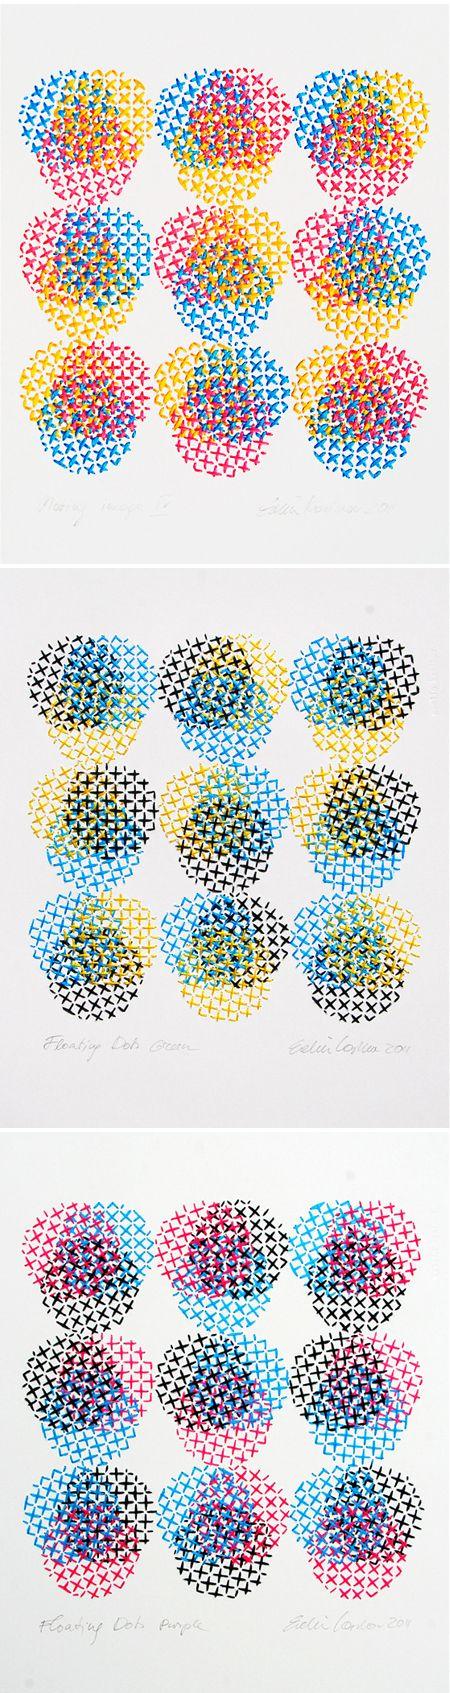 The Jealous Curator » Blog Archive » i'm jealous of Evelin Kasikov - Medium cross stitch